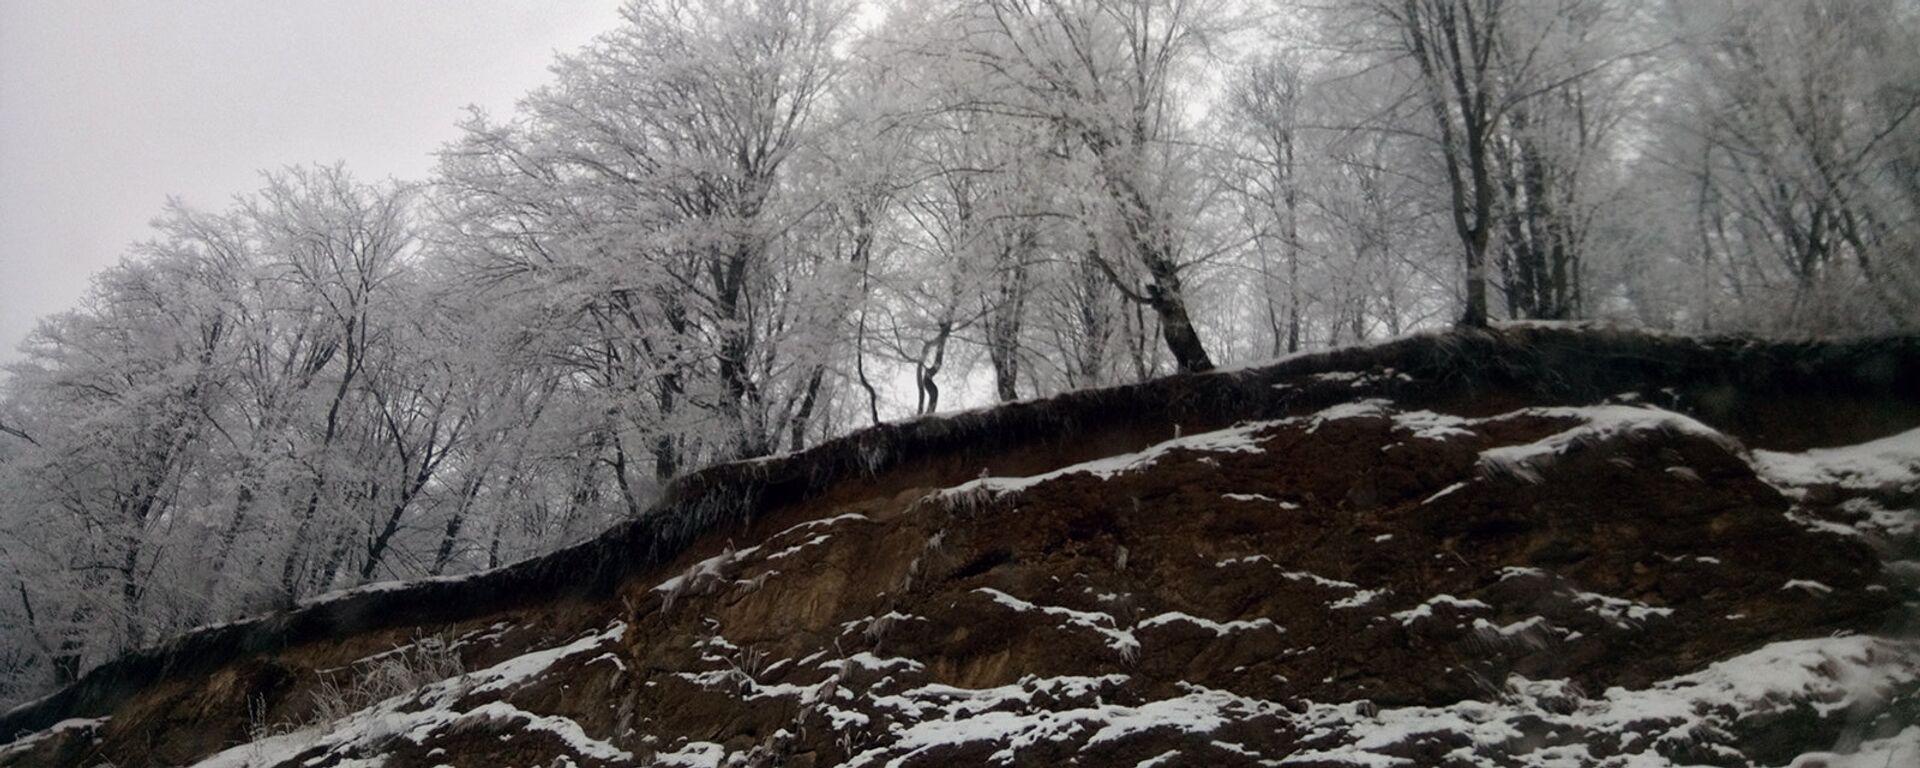 Зима в Армении - Sputnik Армения, 1920, 16.09.2021